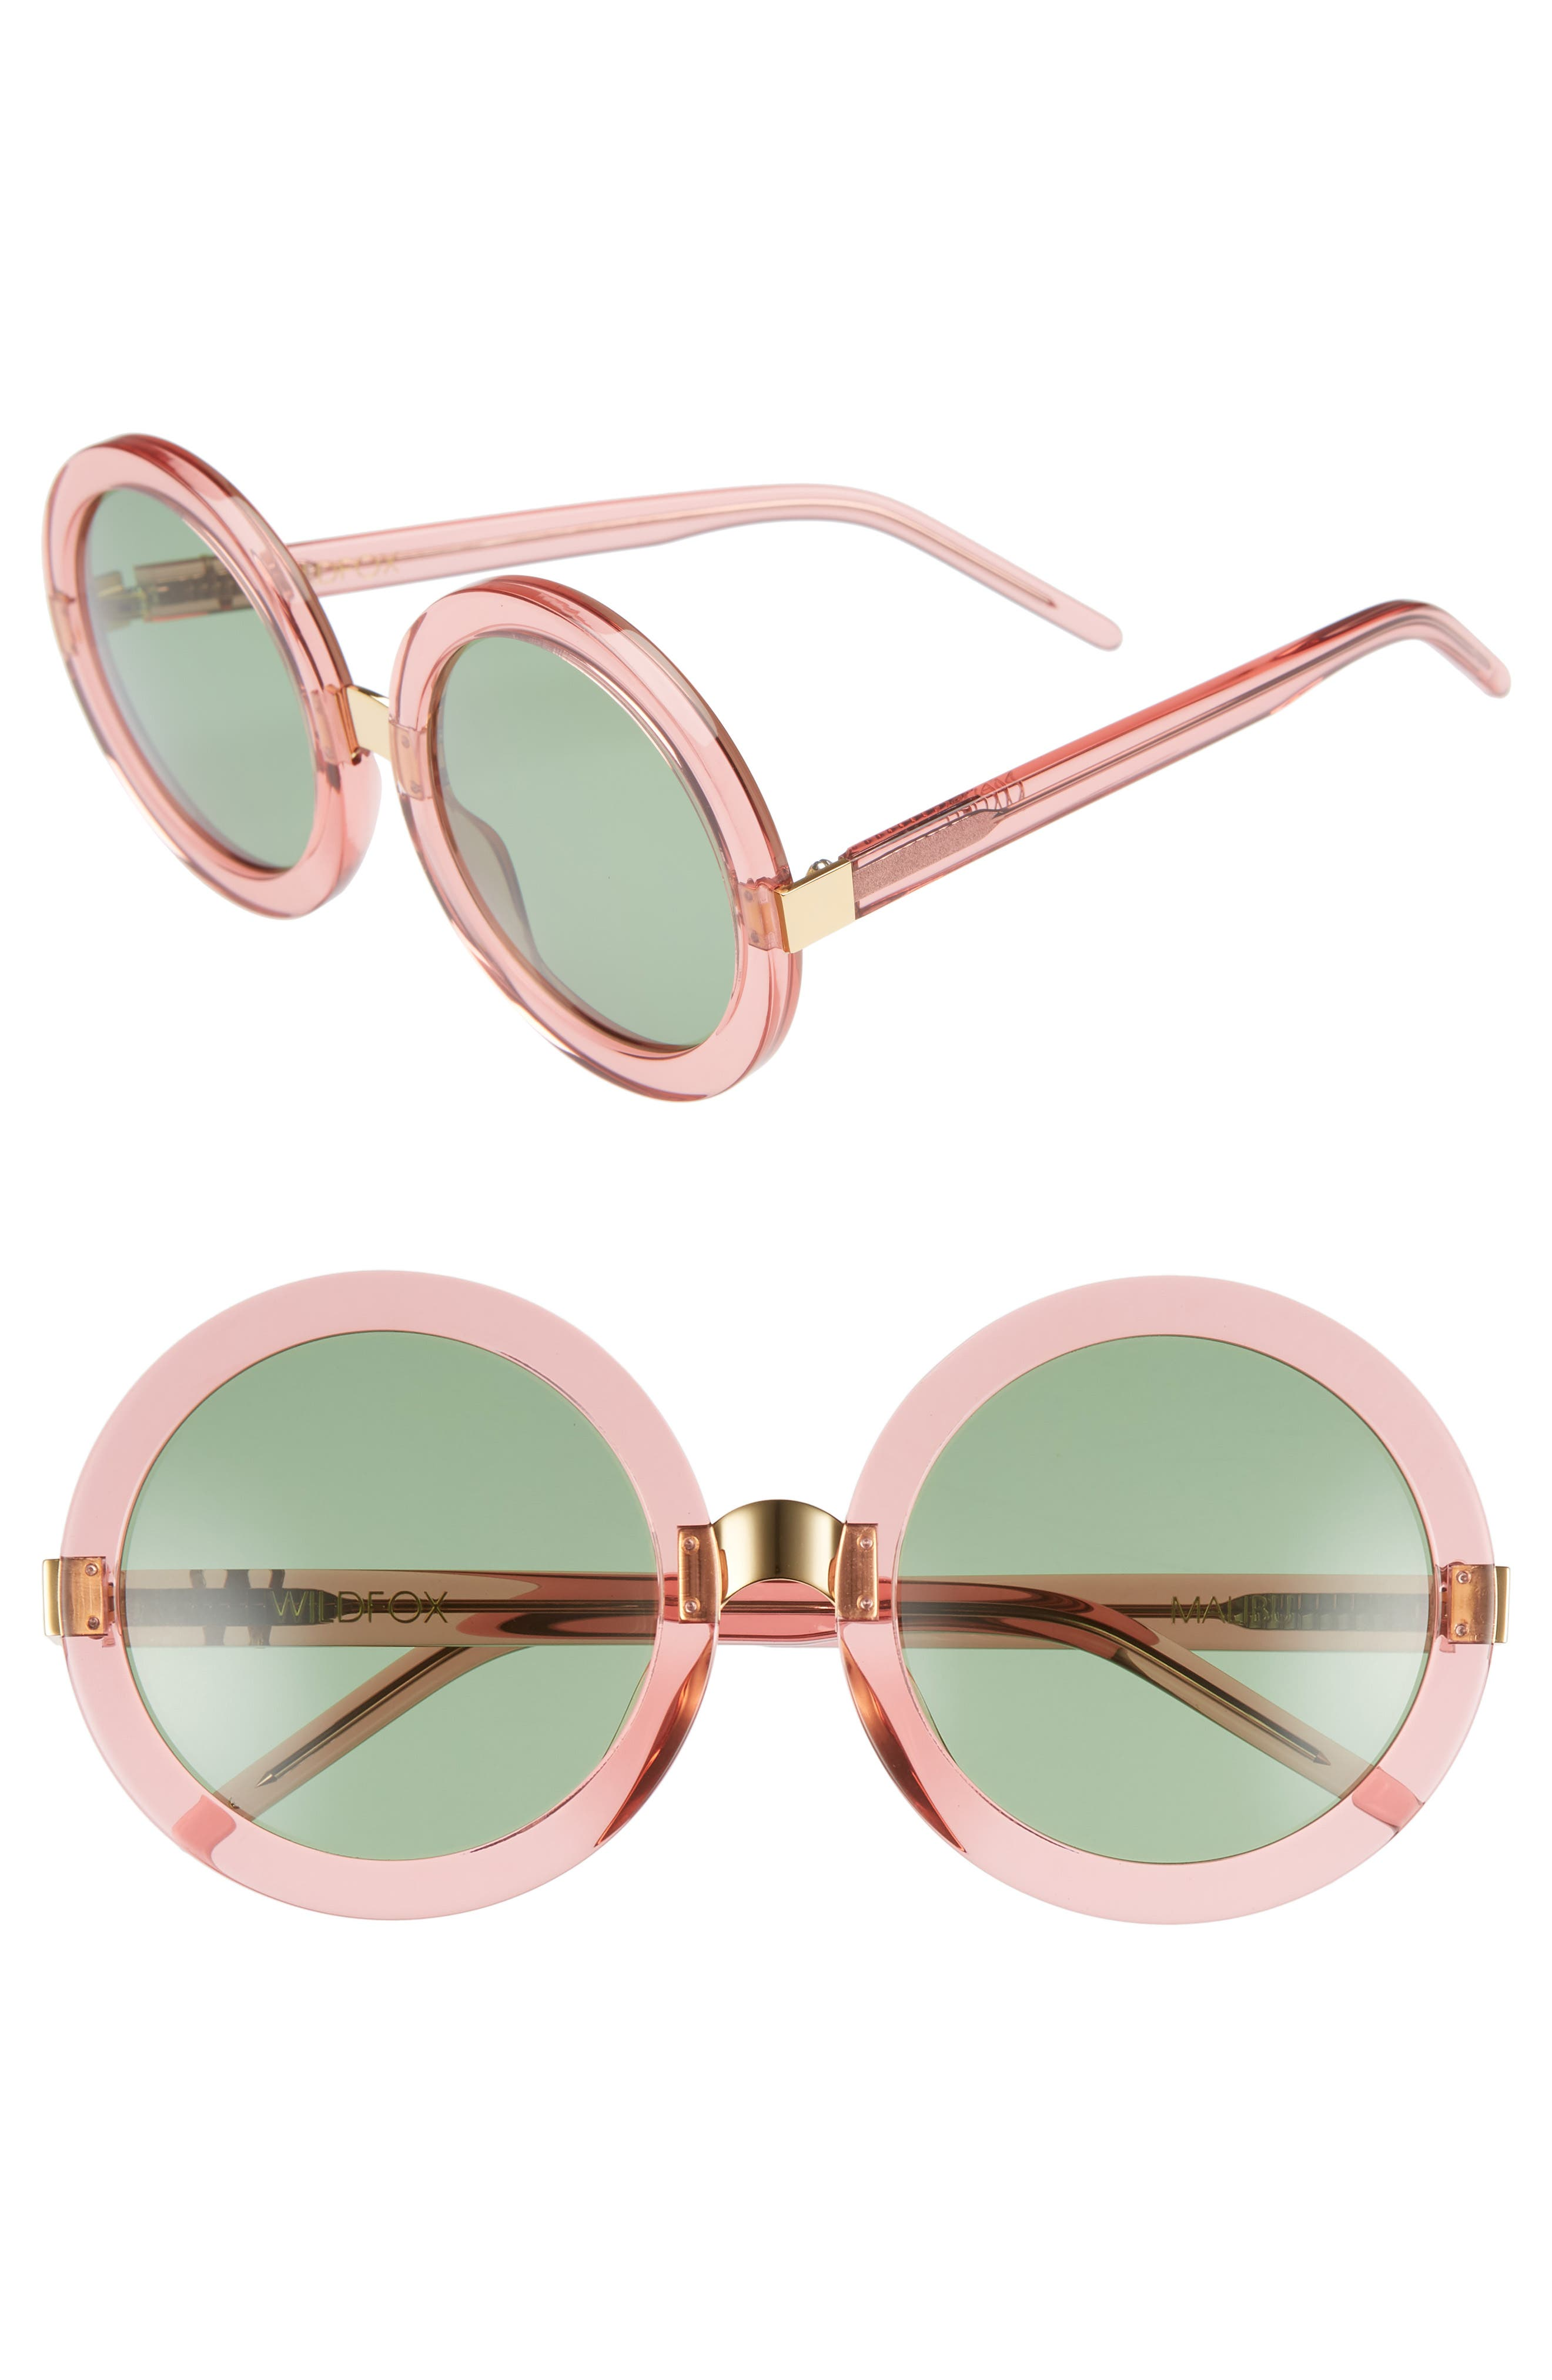 'Malibu' 56mm Round Sunglasses,                             Main thumbnail 1, color,                             Rosewater/ Bottle Green